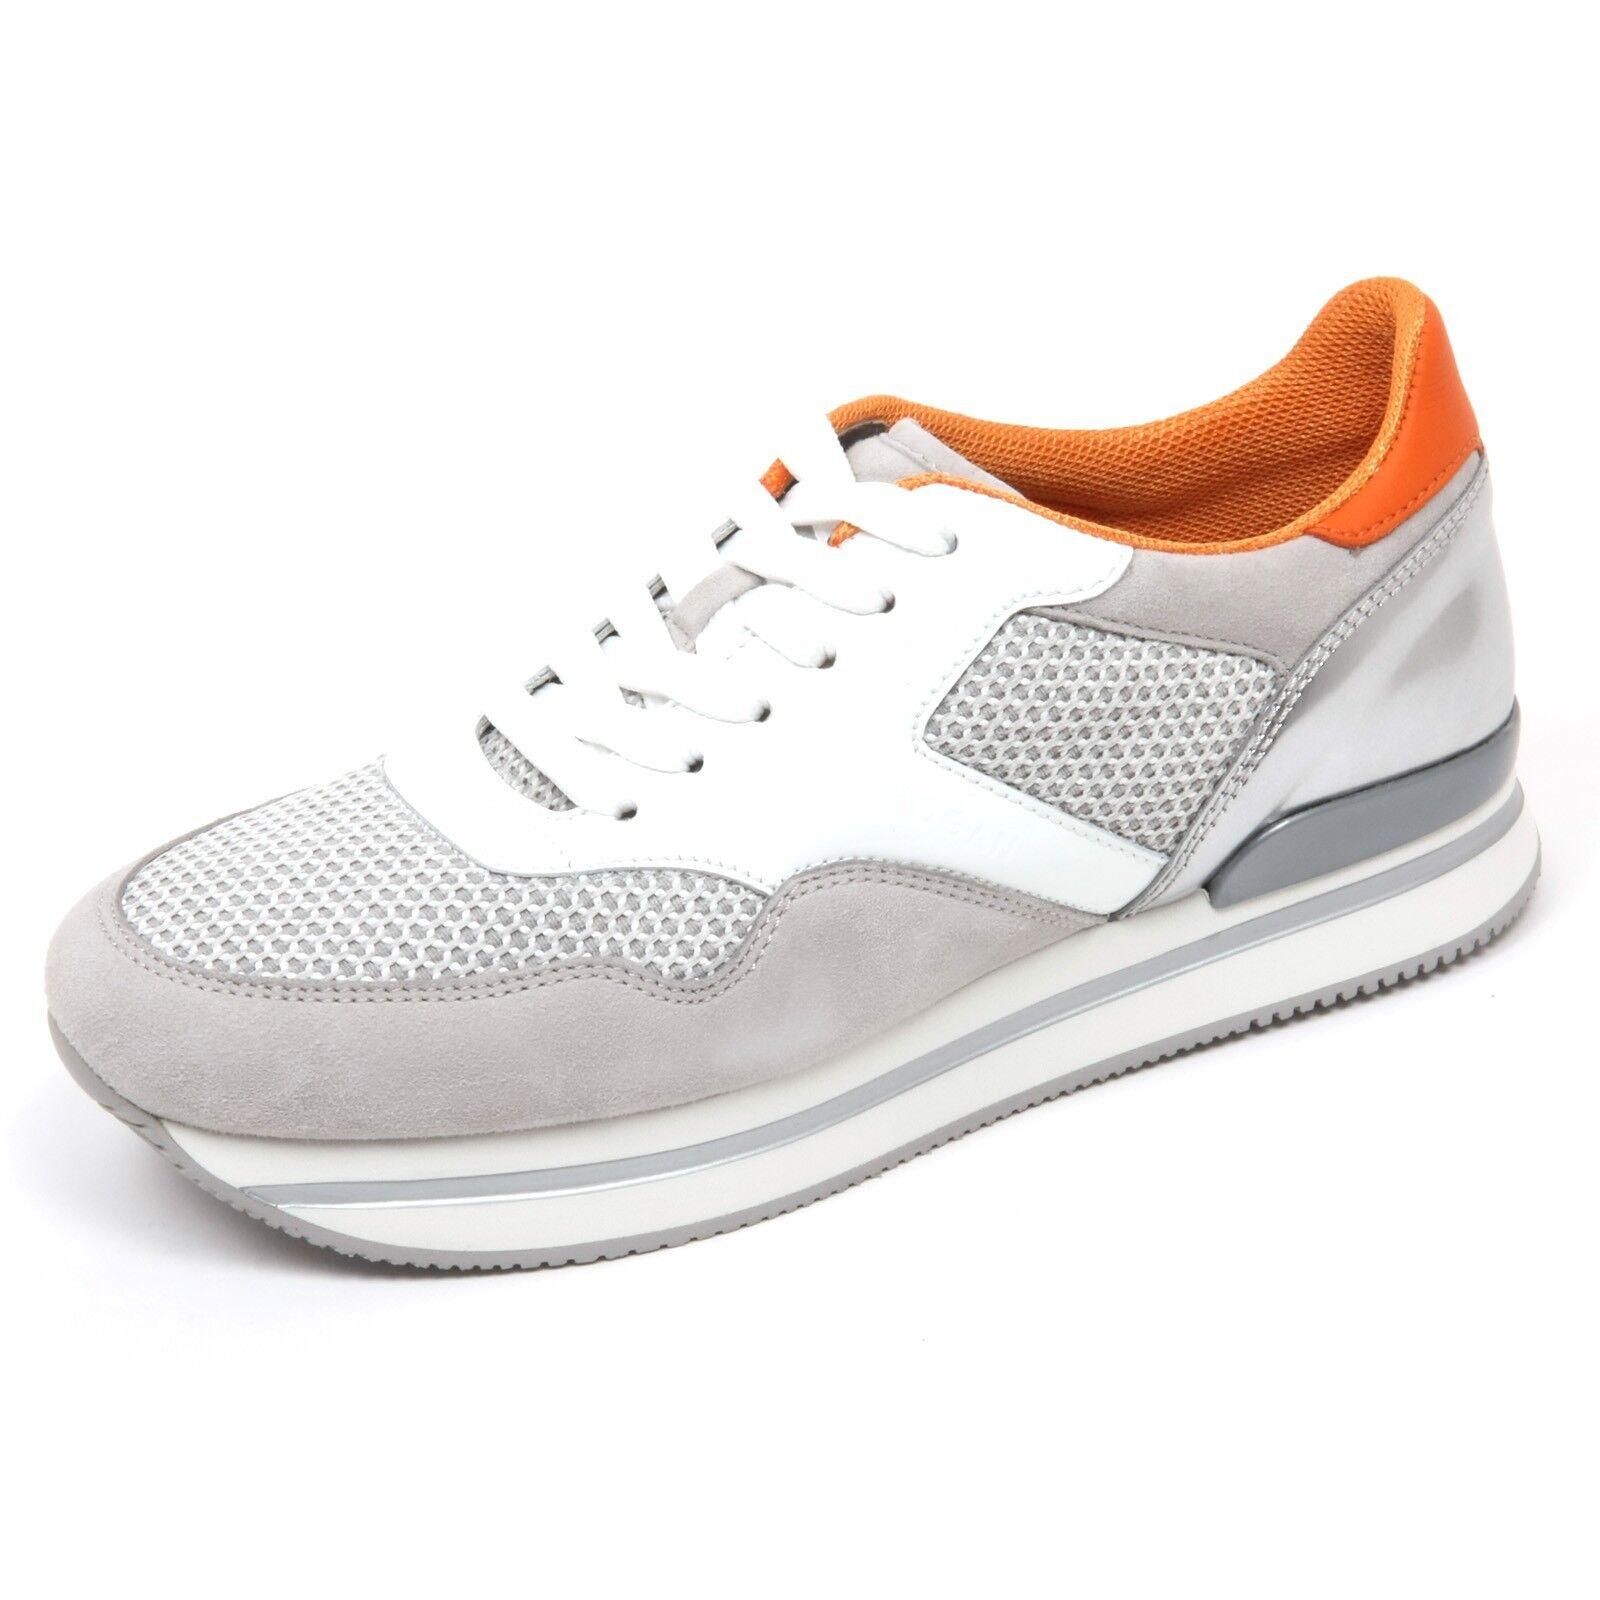 C7514 sneaker scarpa donna HOGAN H222 scarpa sneaker bianco/grigio shoe woman e6f175